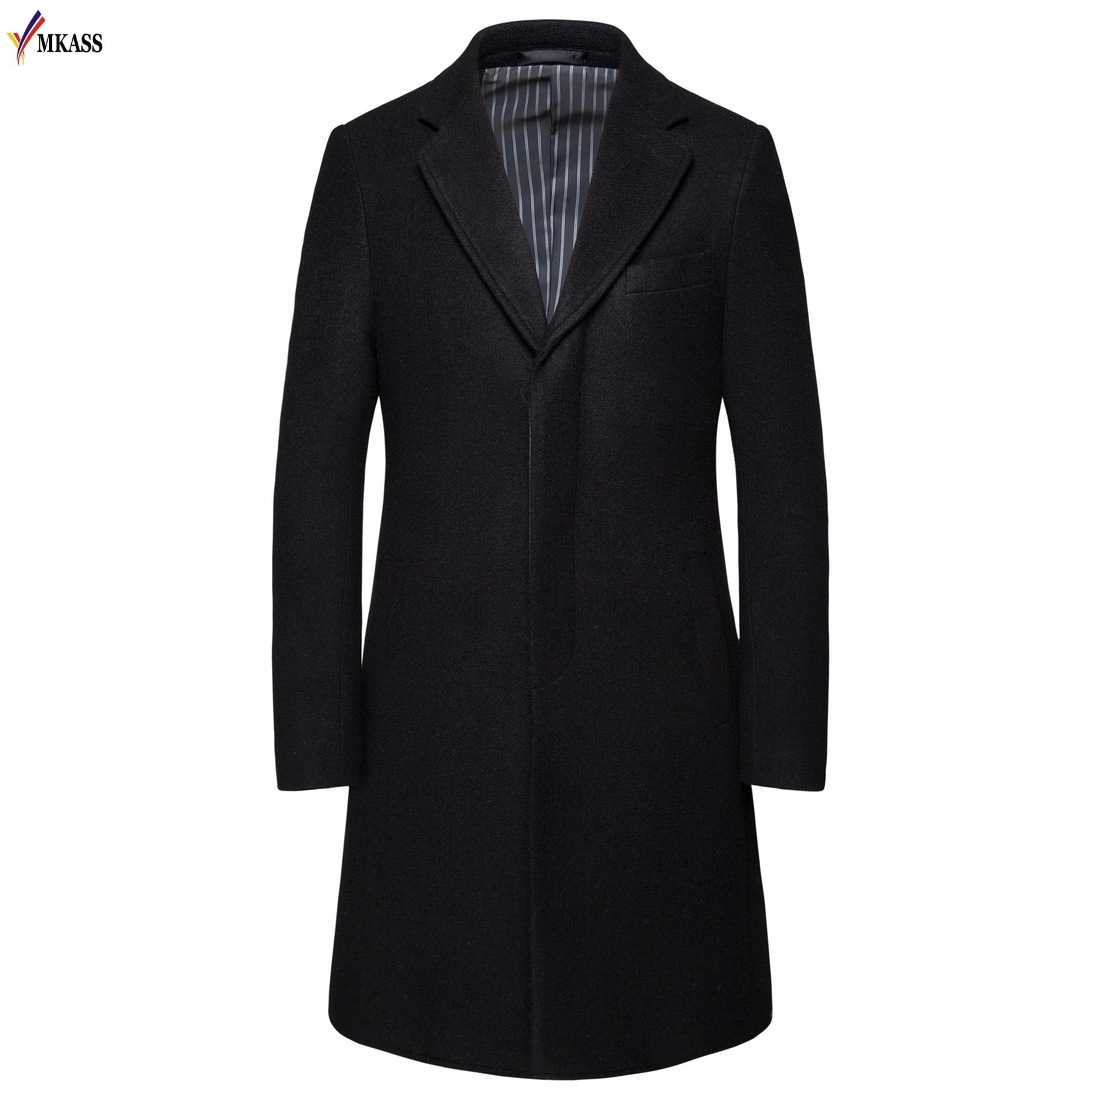 Men/'s Trench Coats Long Sleeve Cardigan Knee Length Casual Windproof Overcoat US